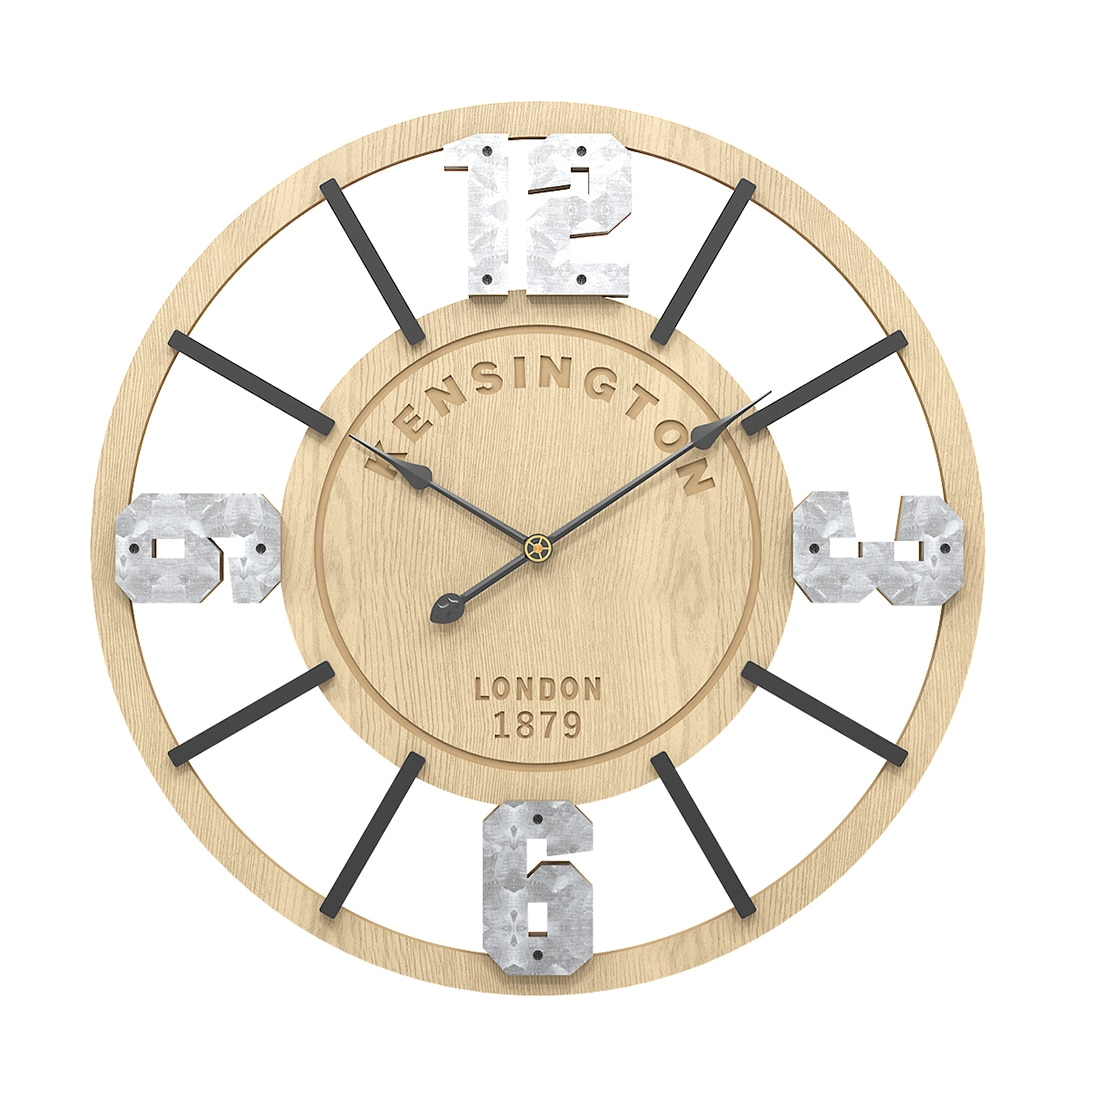 Horloge murale rétro en fer et bois MDF 50 cm